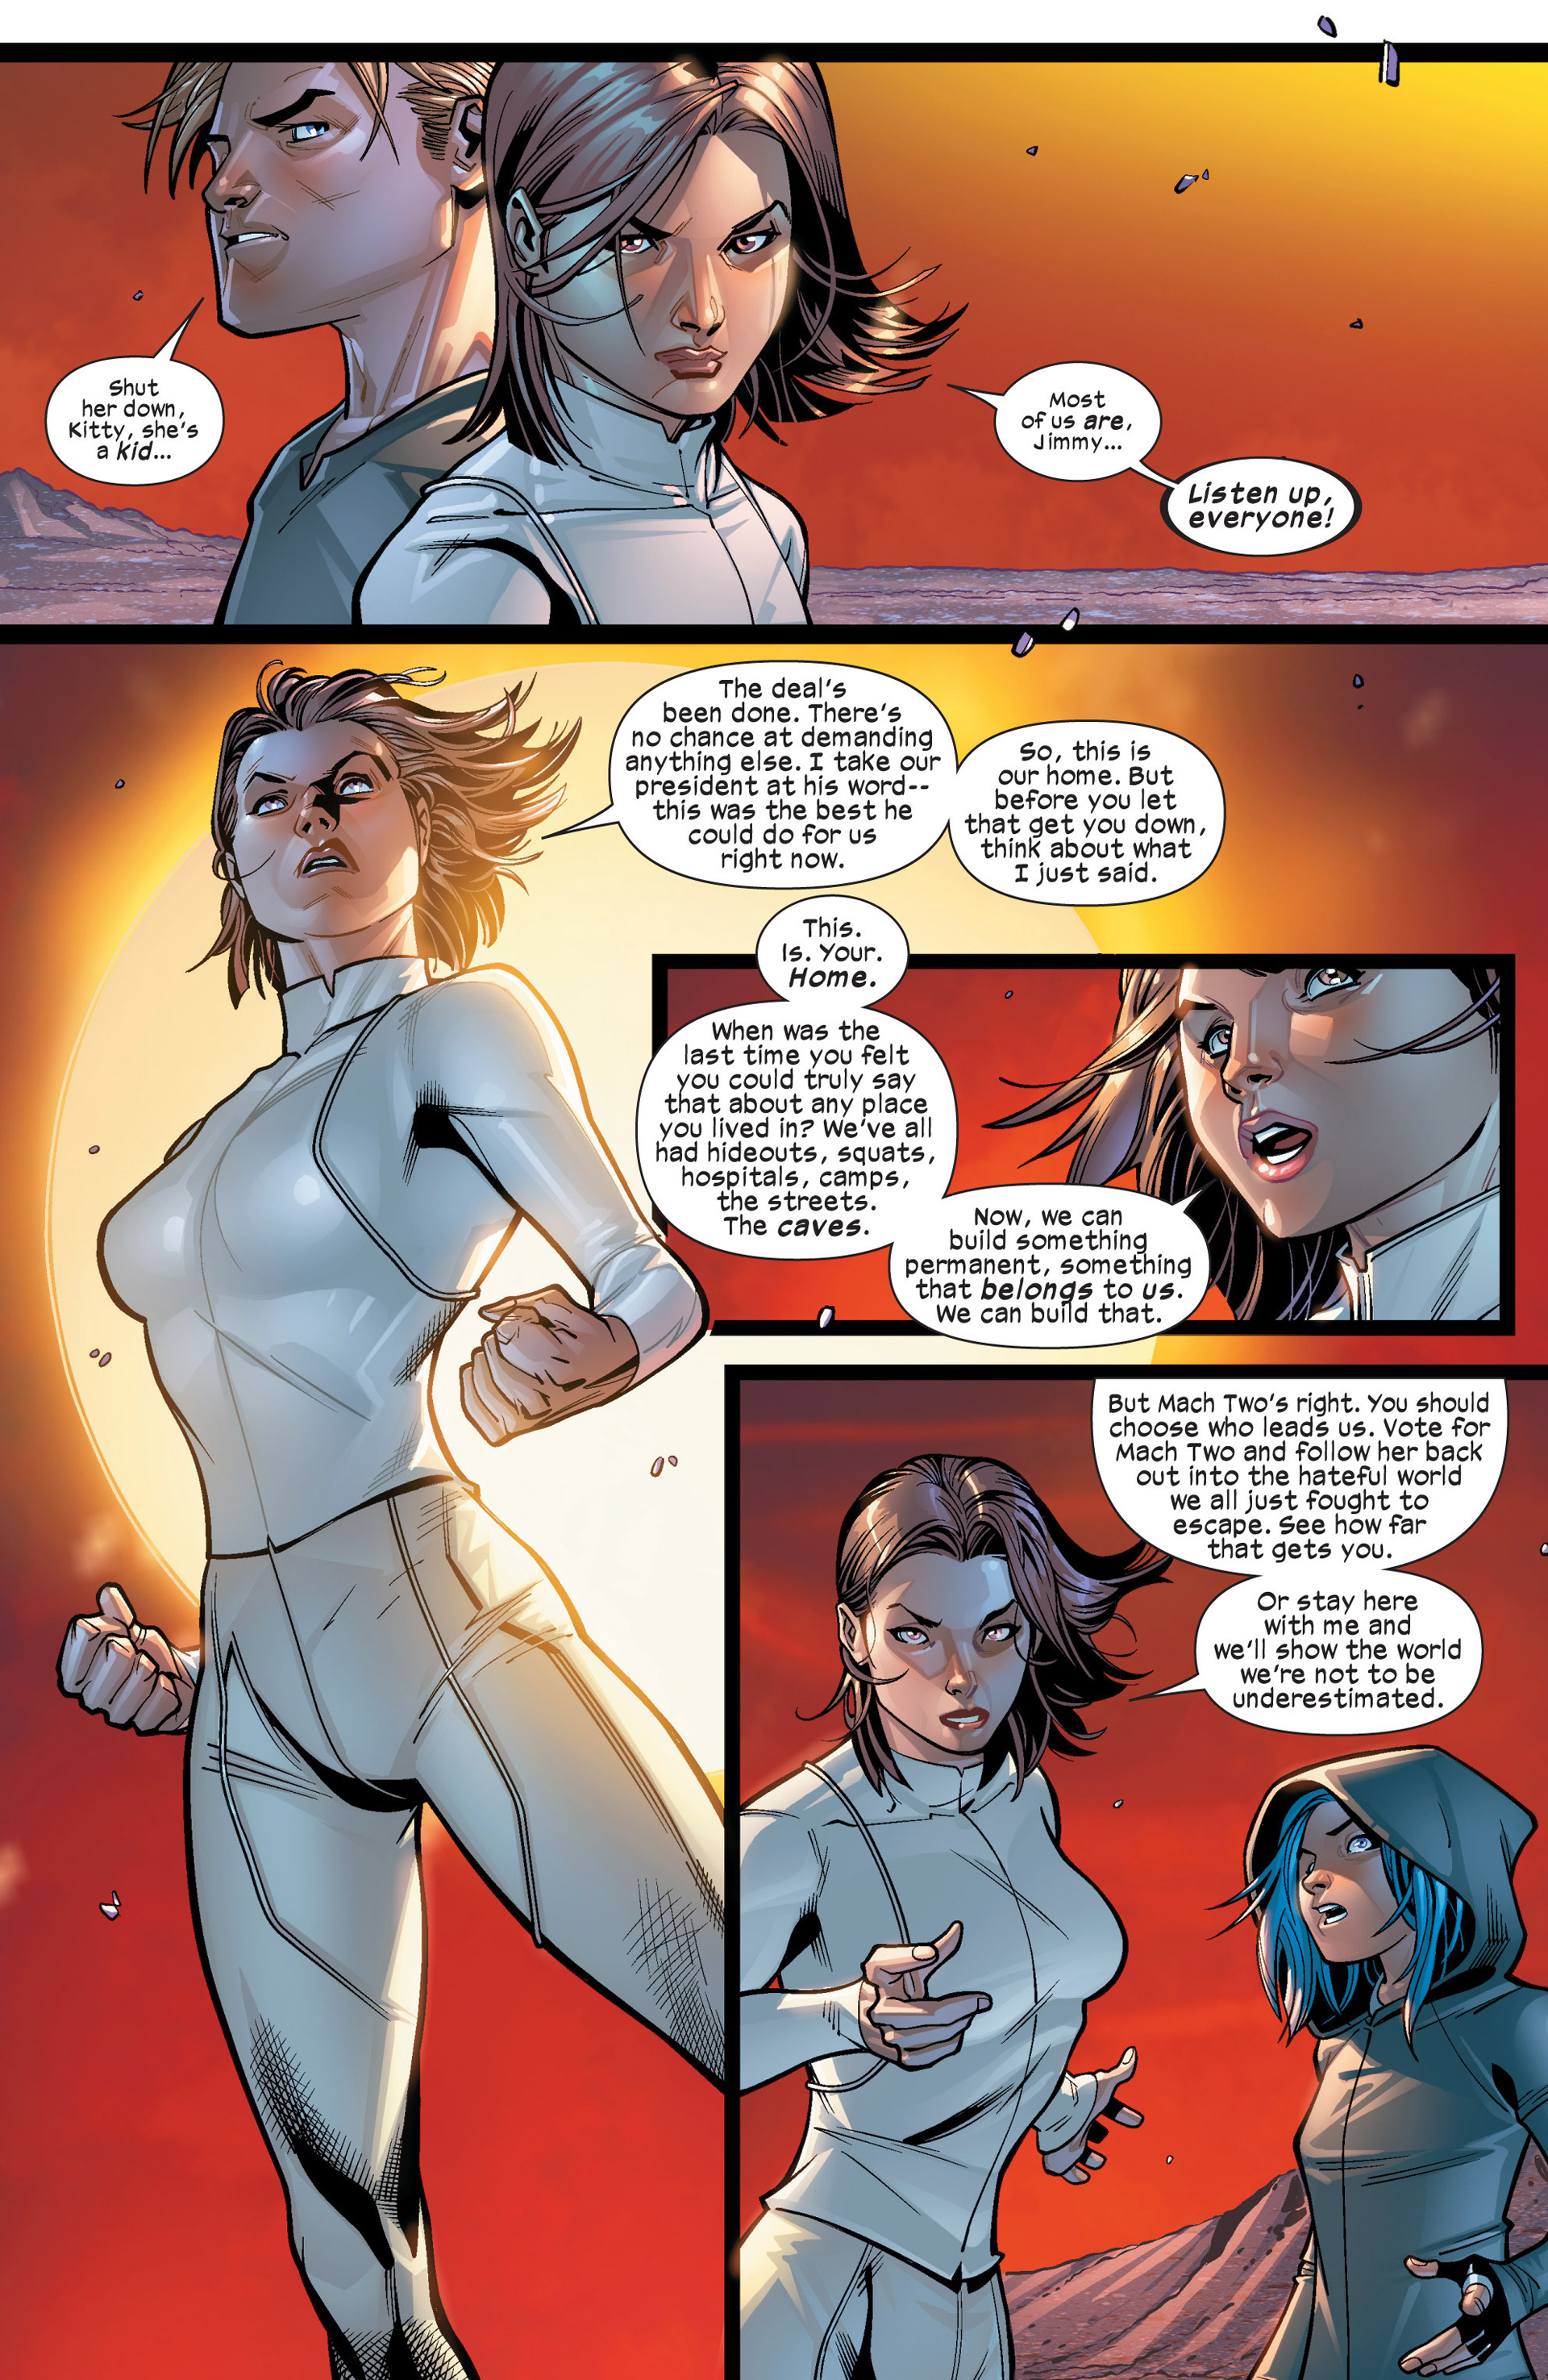 Read online Ultimate Comics X-Men comic -  Issue #19 - 8